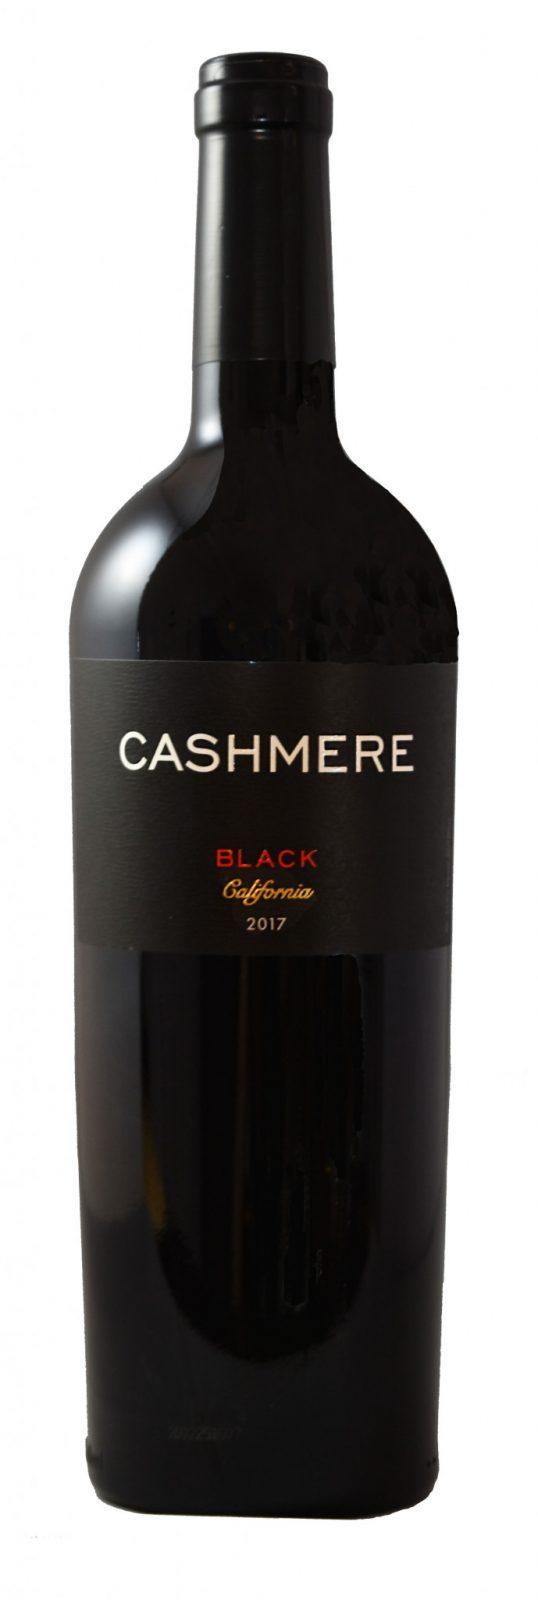 Cline Cashmere Black